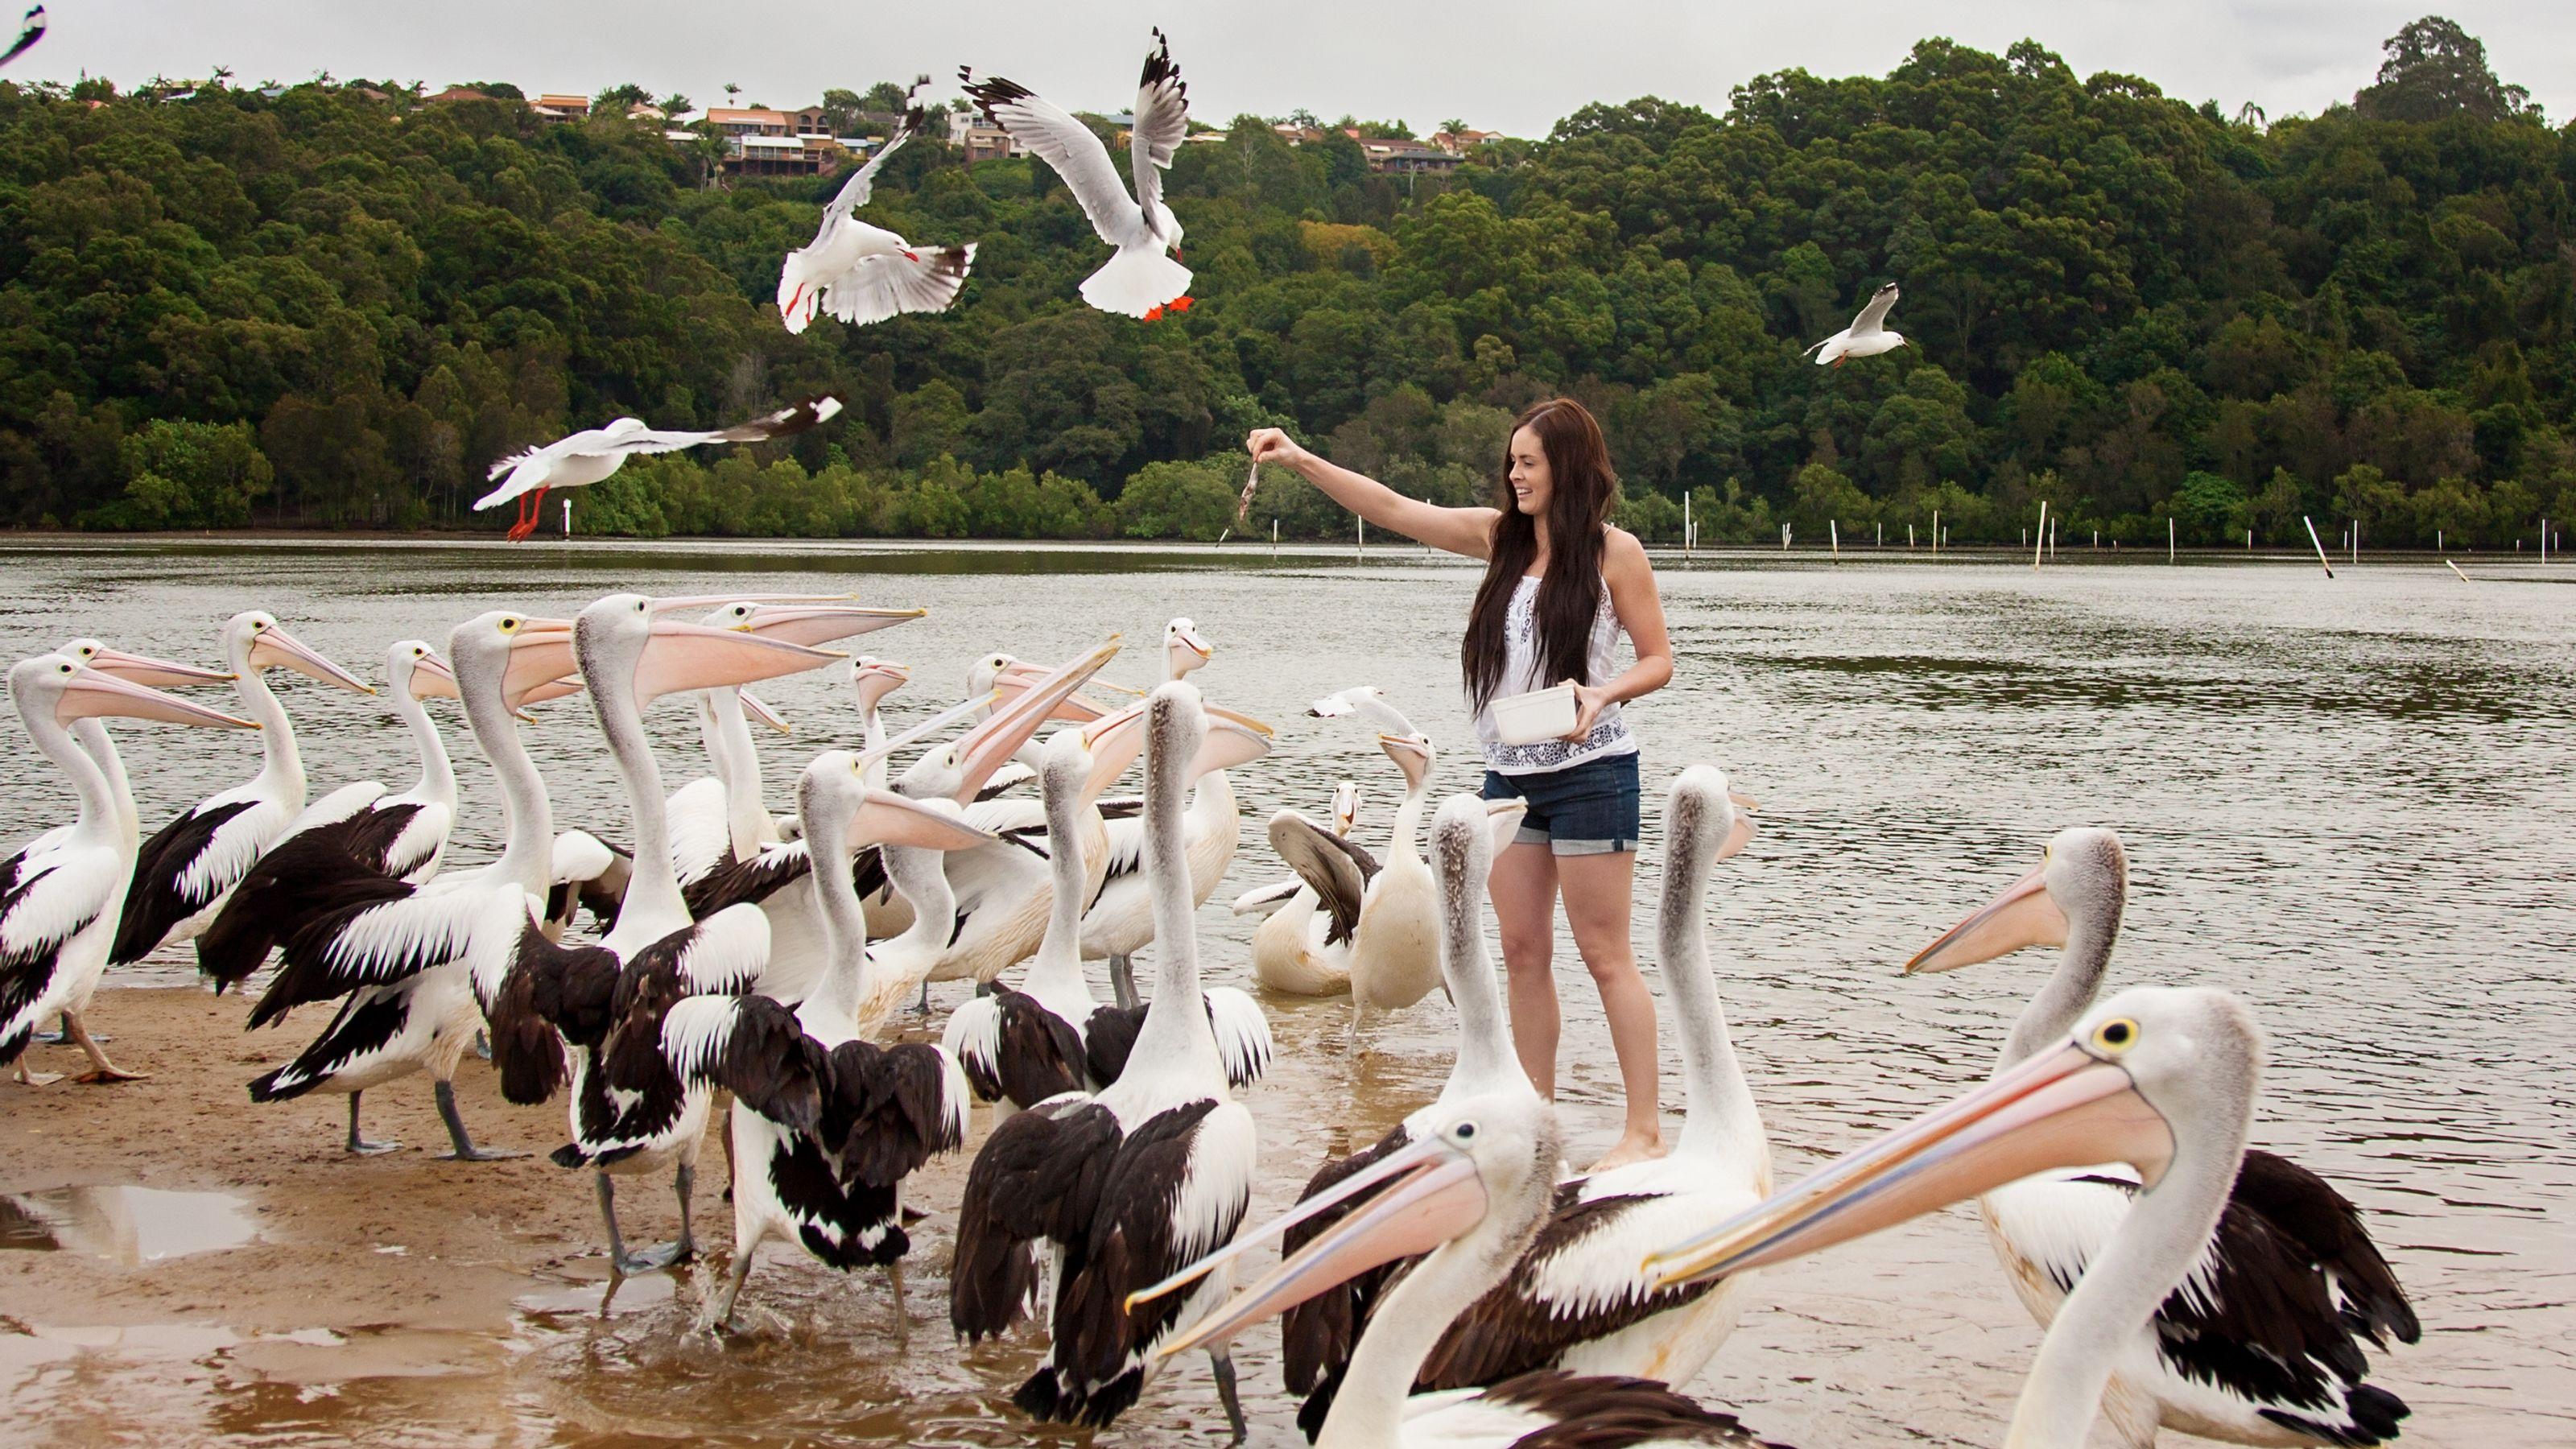 girl feeding pelicans shrimps at the beach in Australia